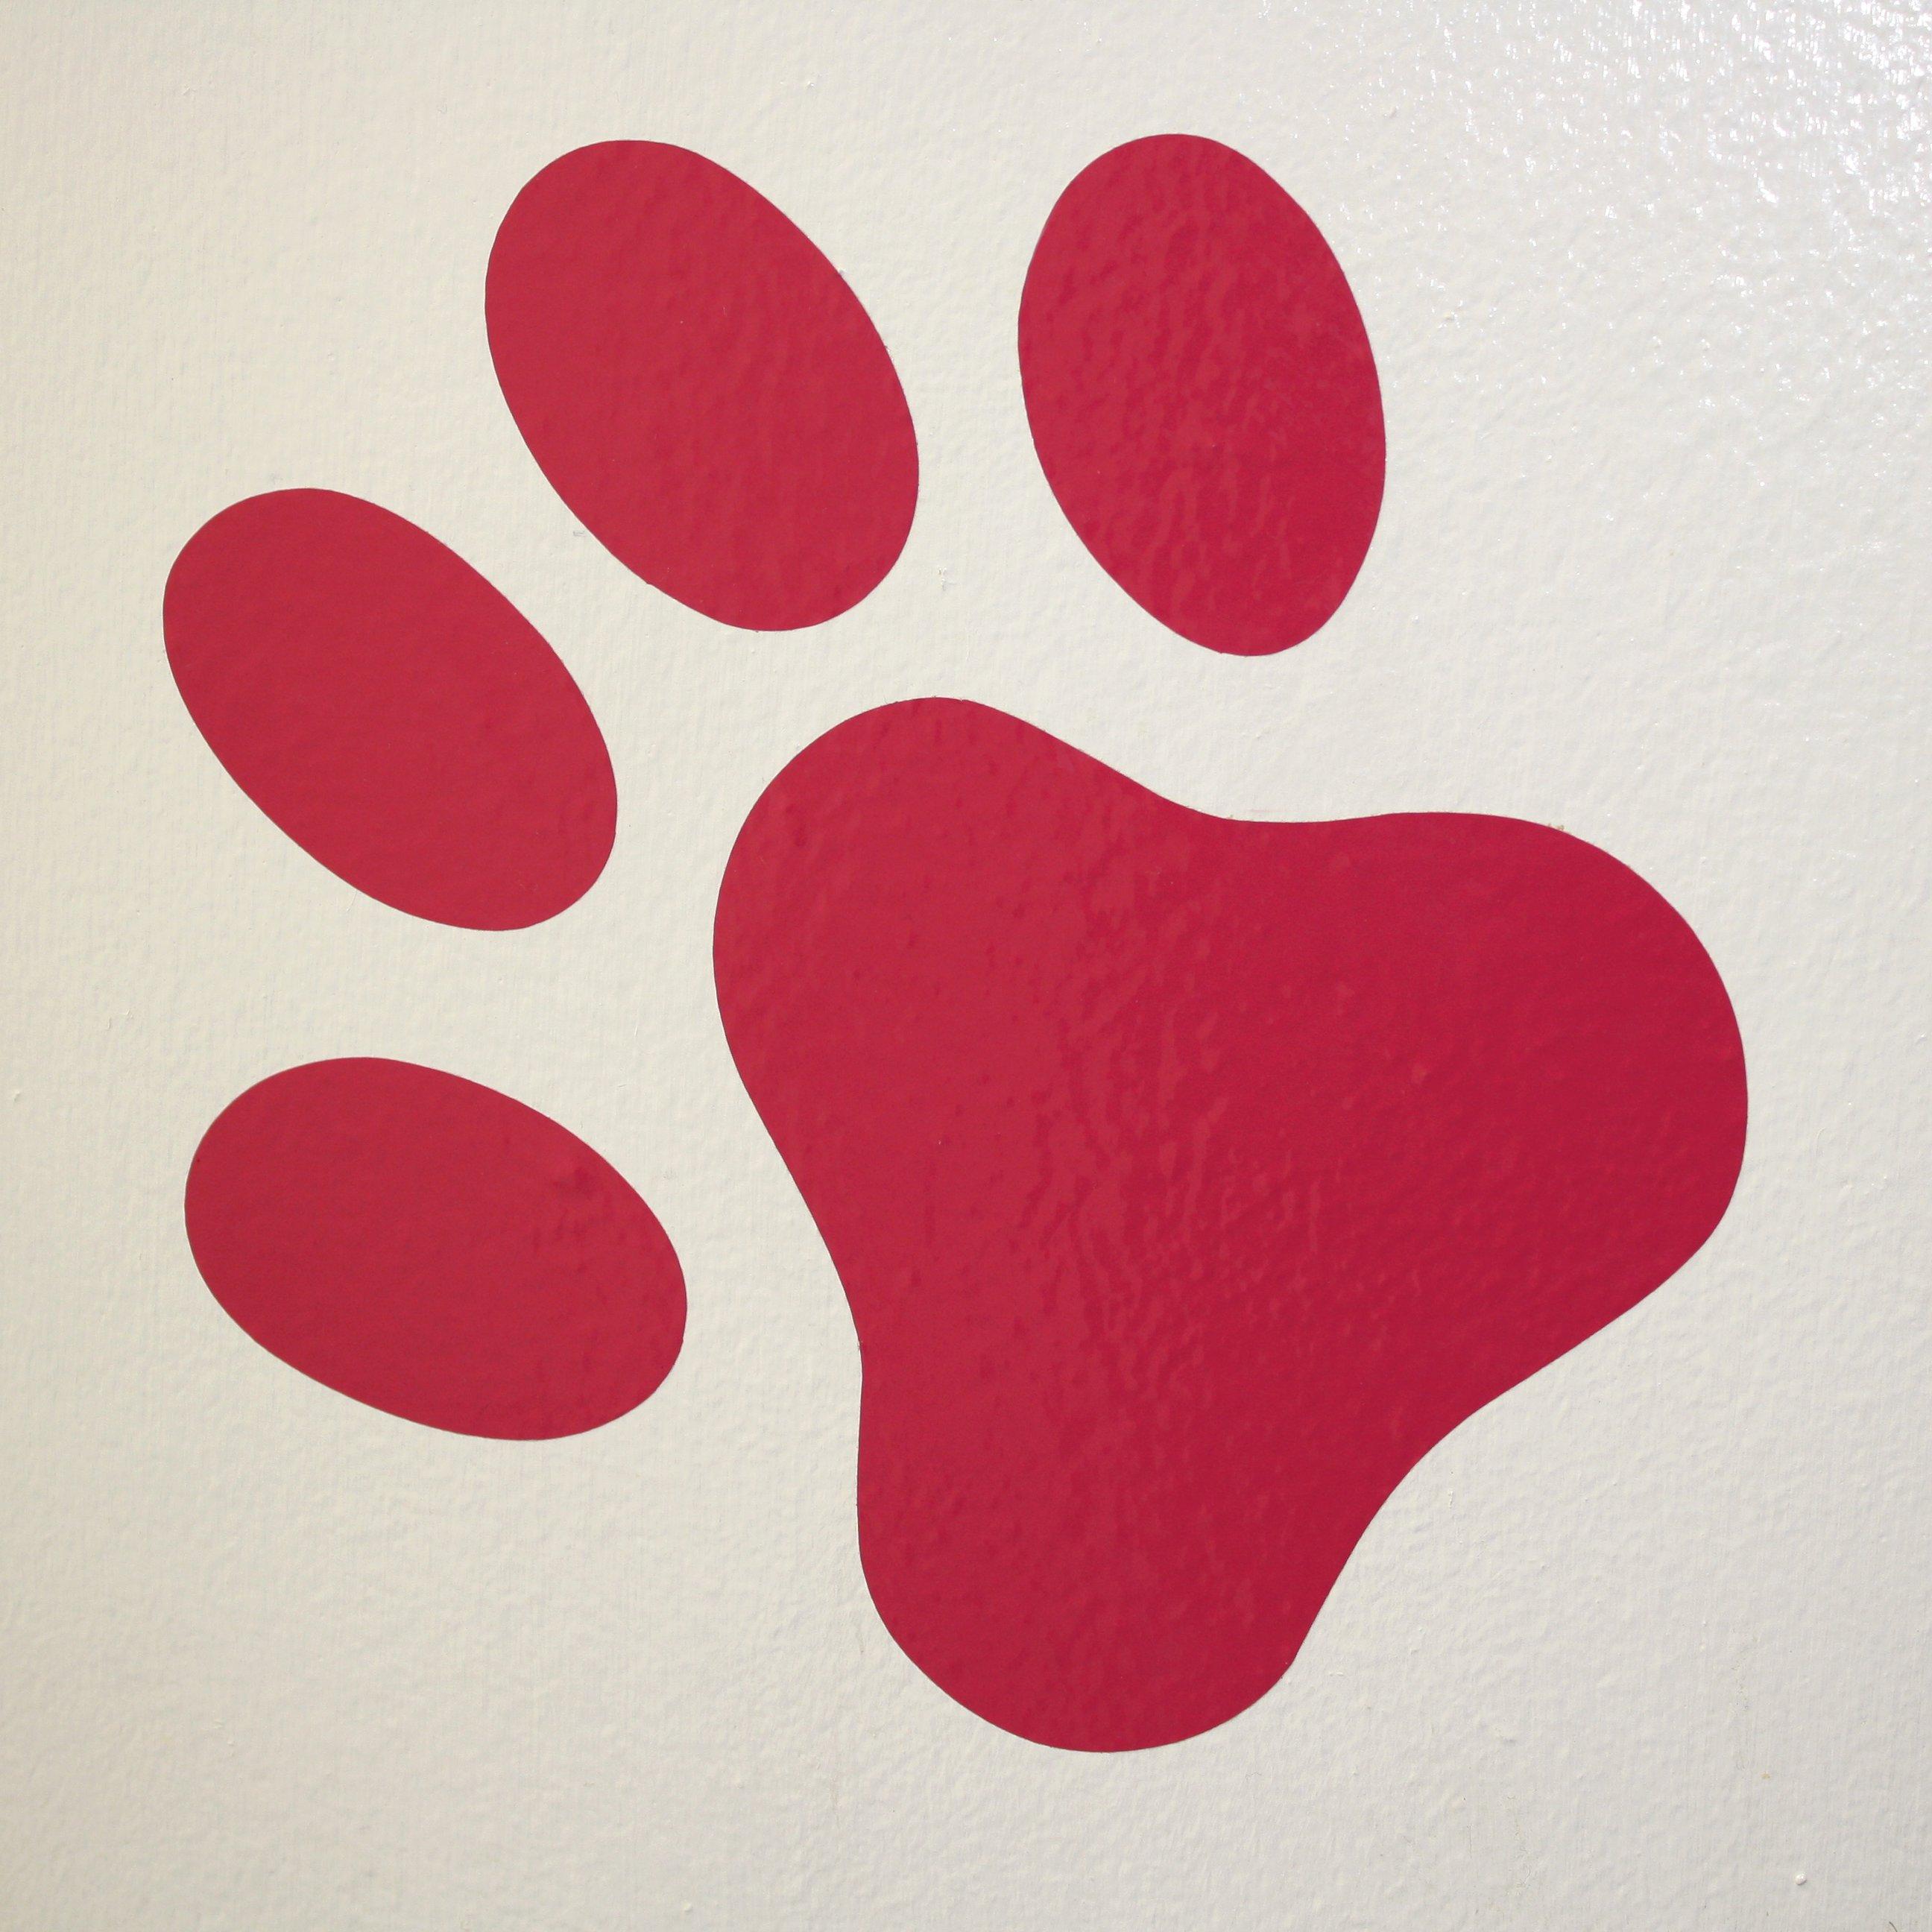 teddy bear paw print clip art - photo #32